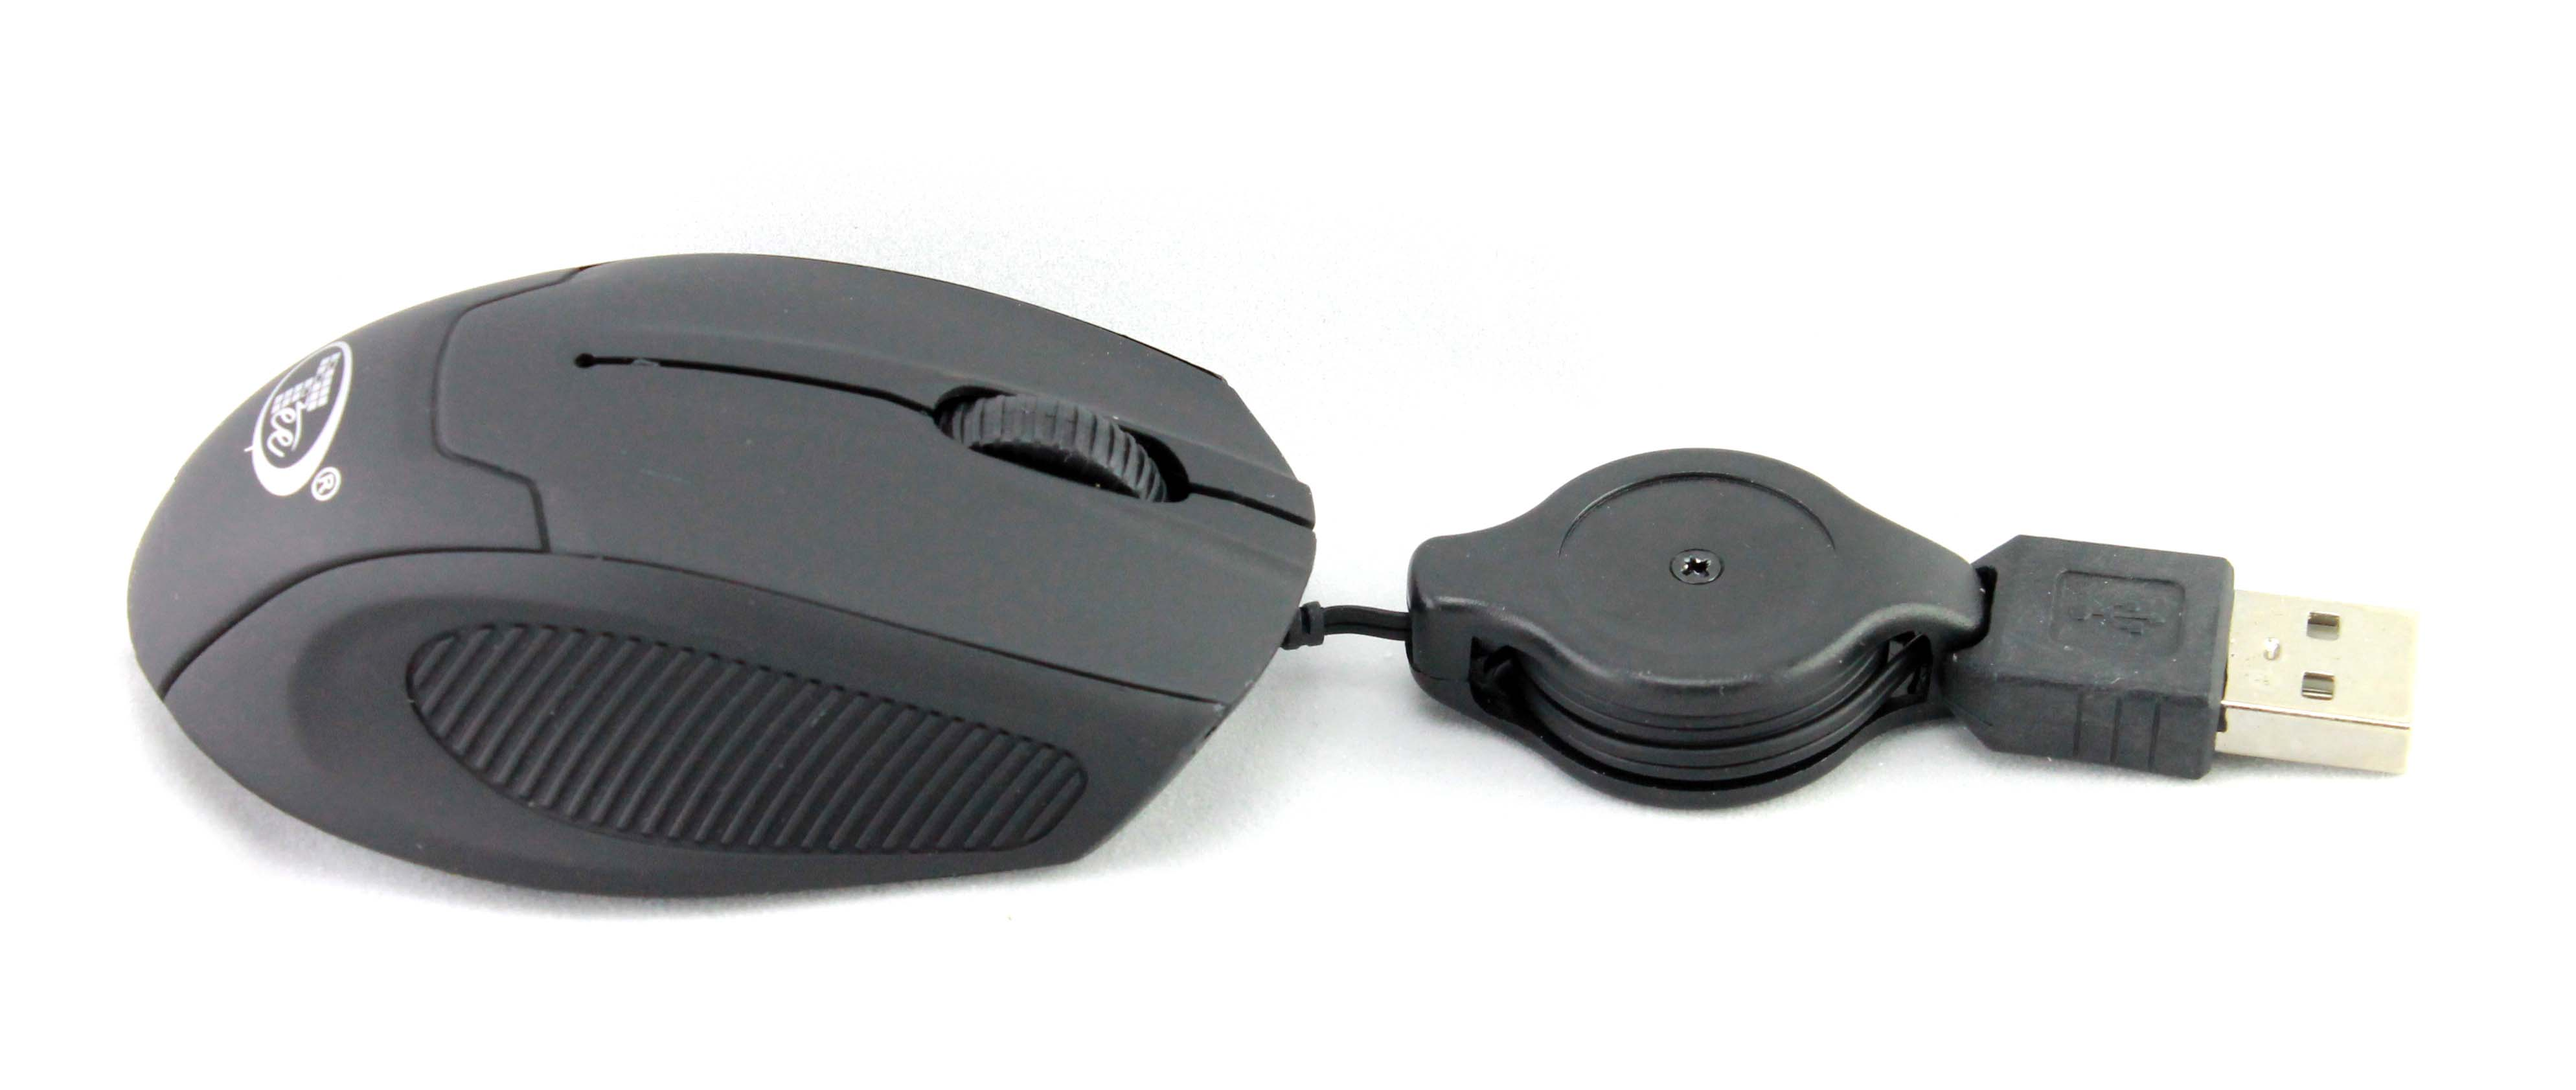 Мишка No brand, Оптична R328, Различни цветове - 917